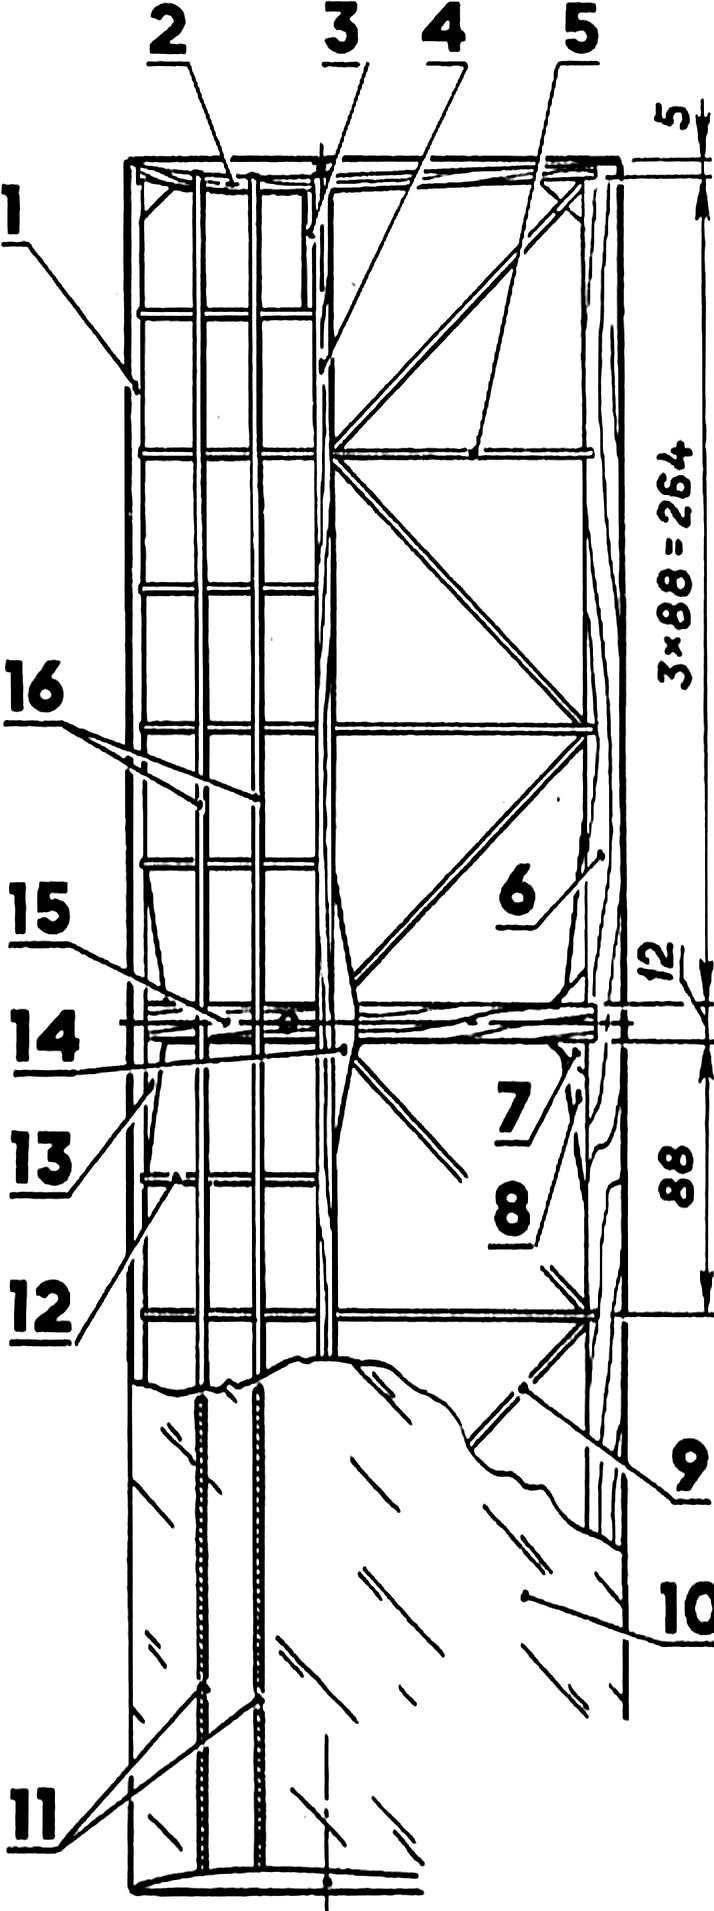 Рис. 3. Центральная часть крыла.